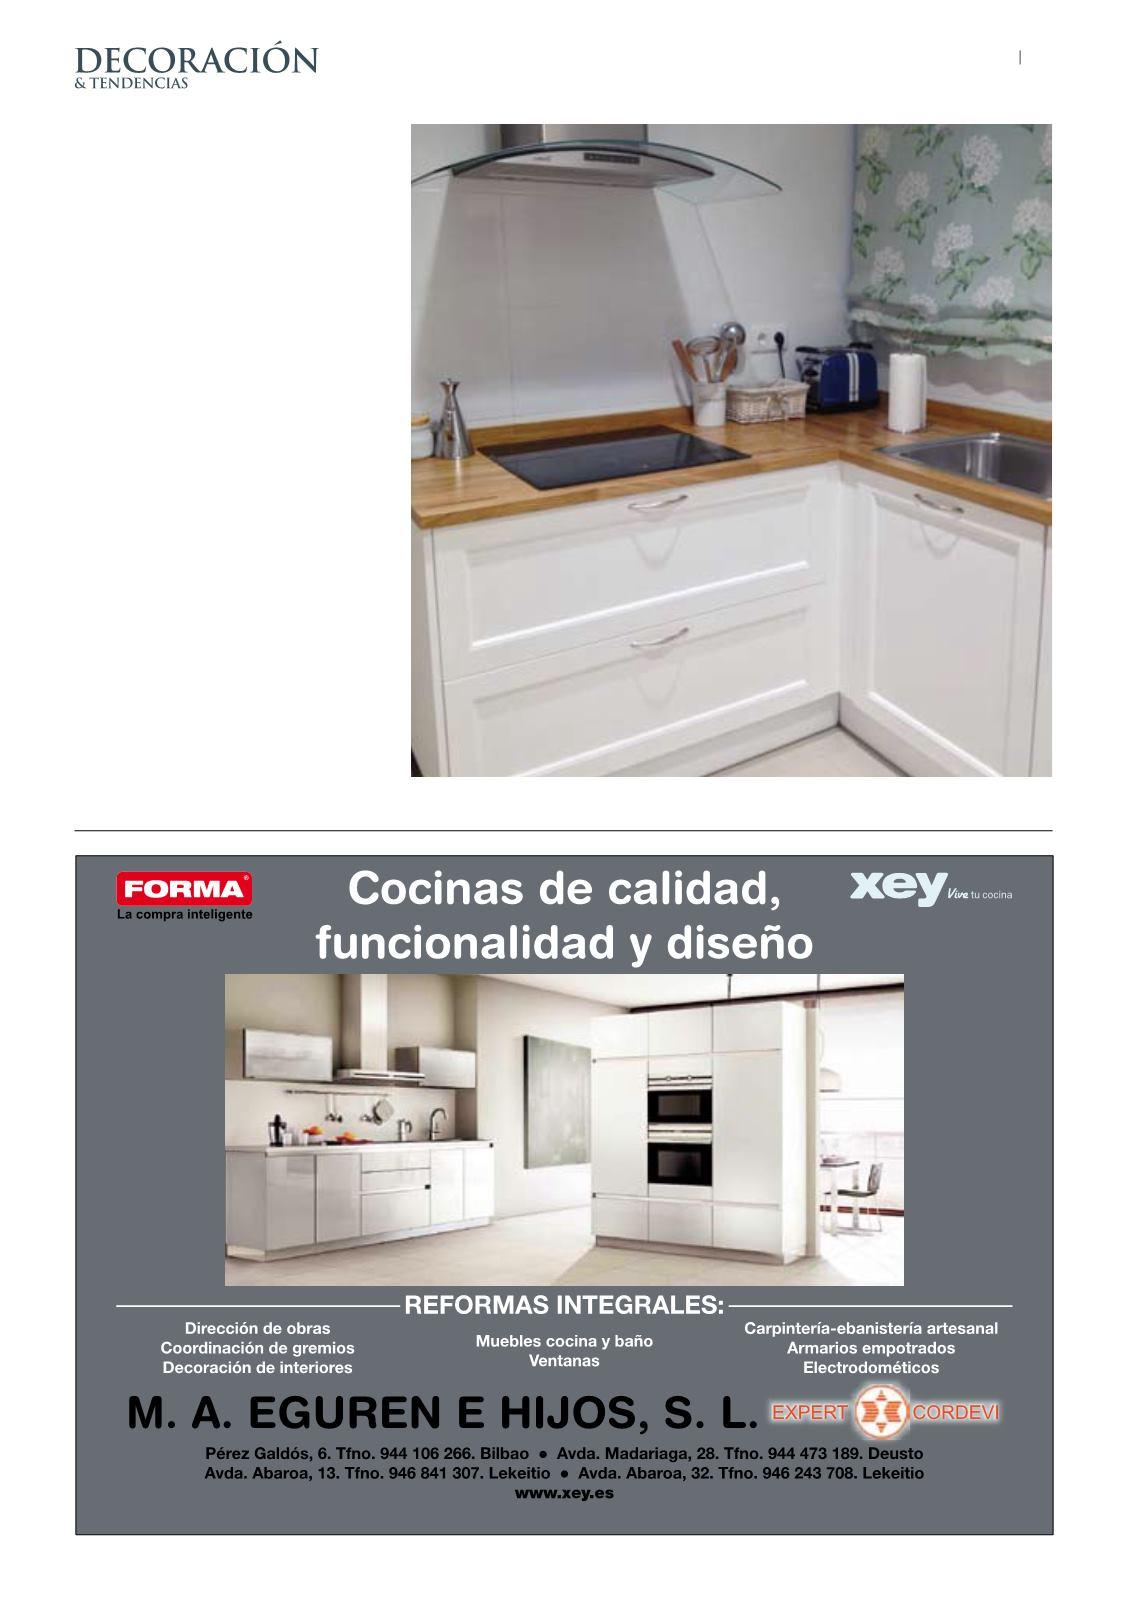 Decoraci N Tendencias # Muebles Eguren Lekeitio